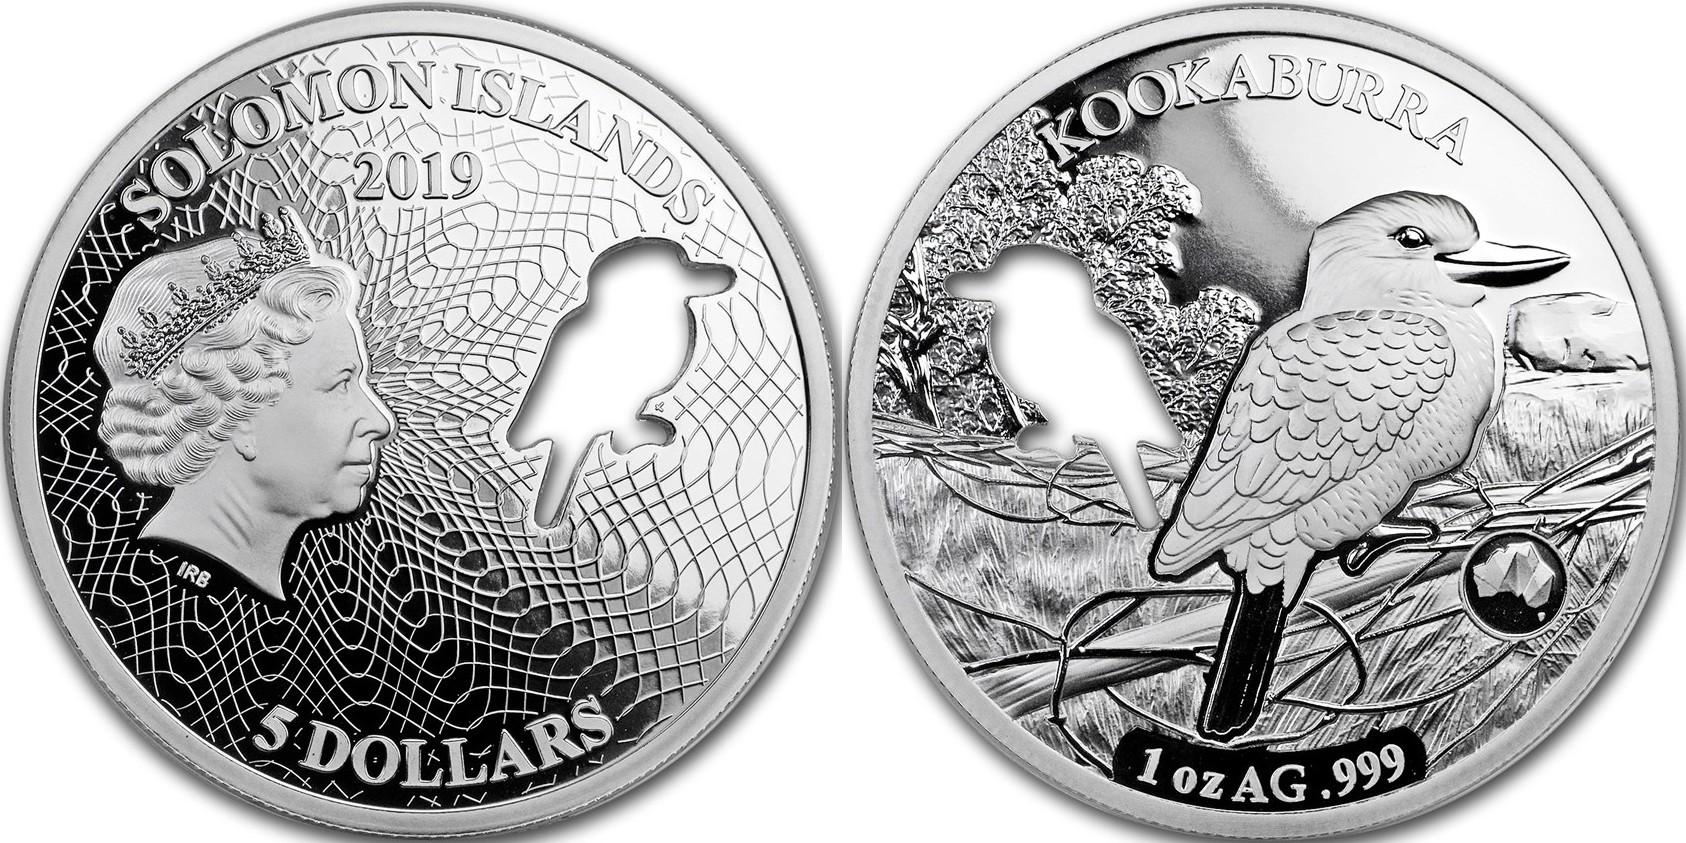 salomon 2019 formes d'australie kookaburra